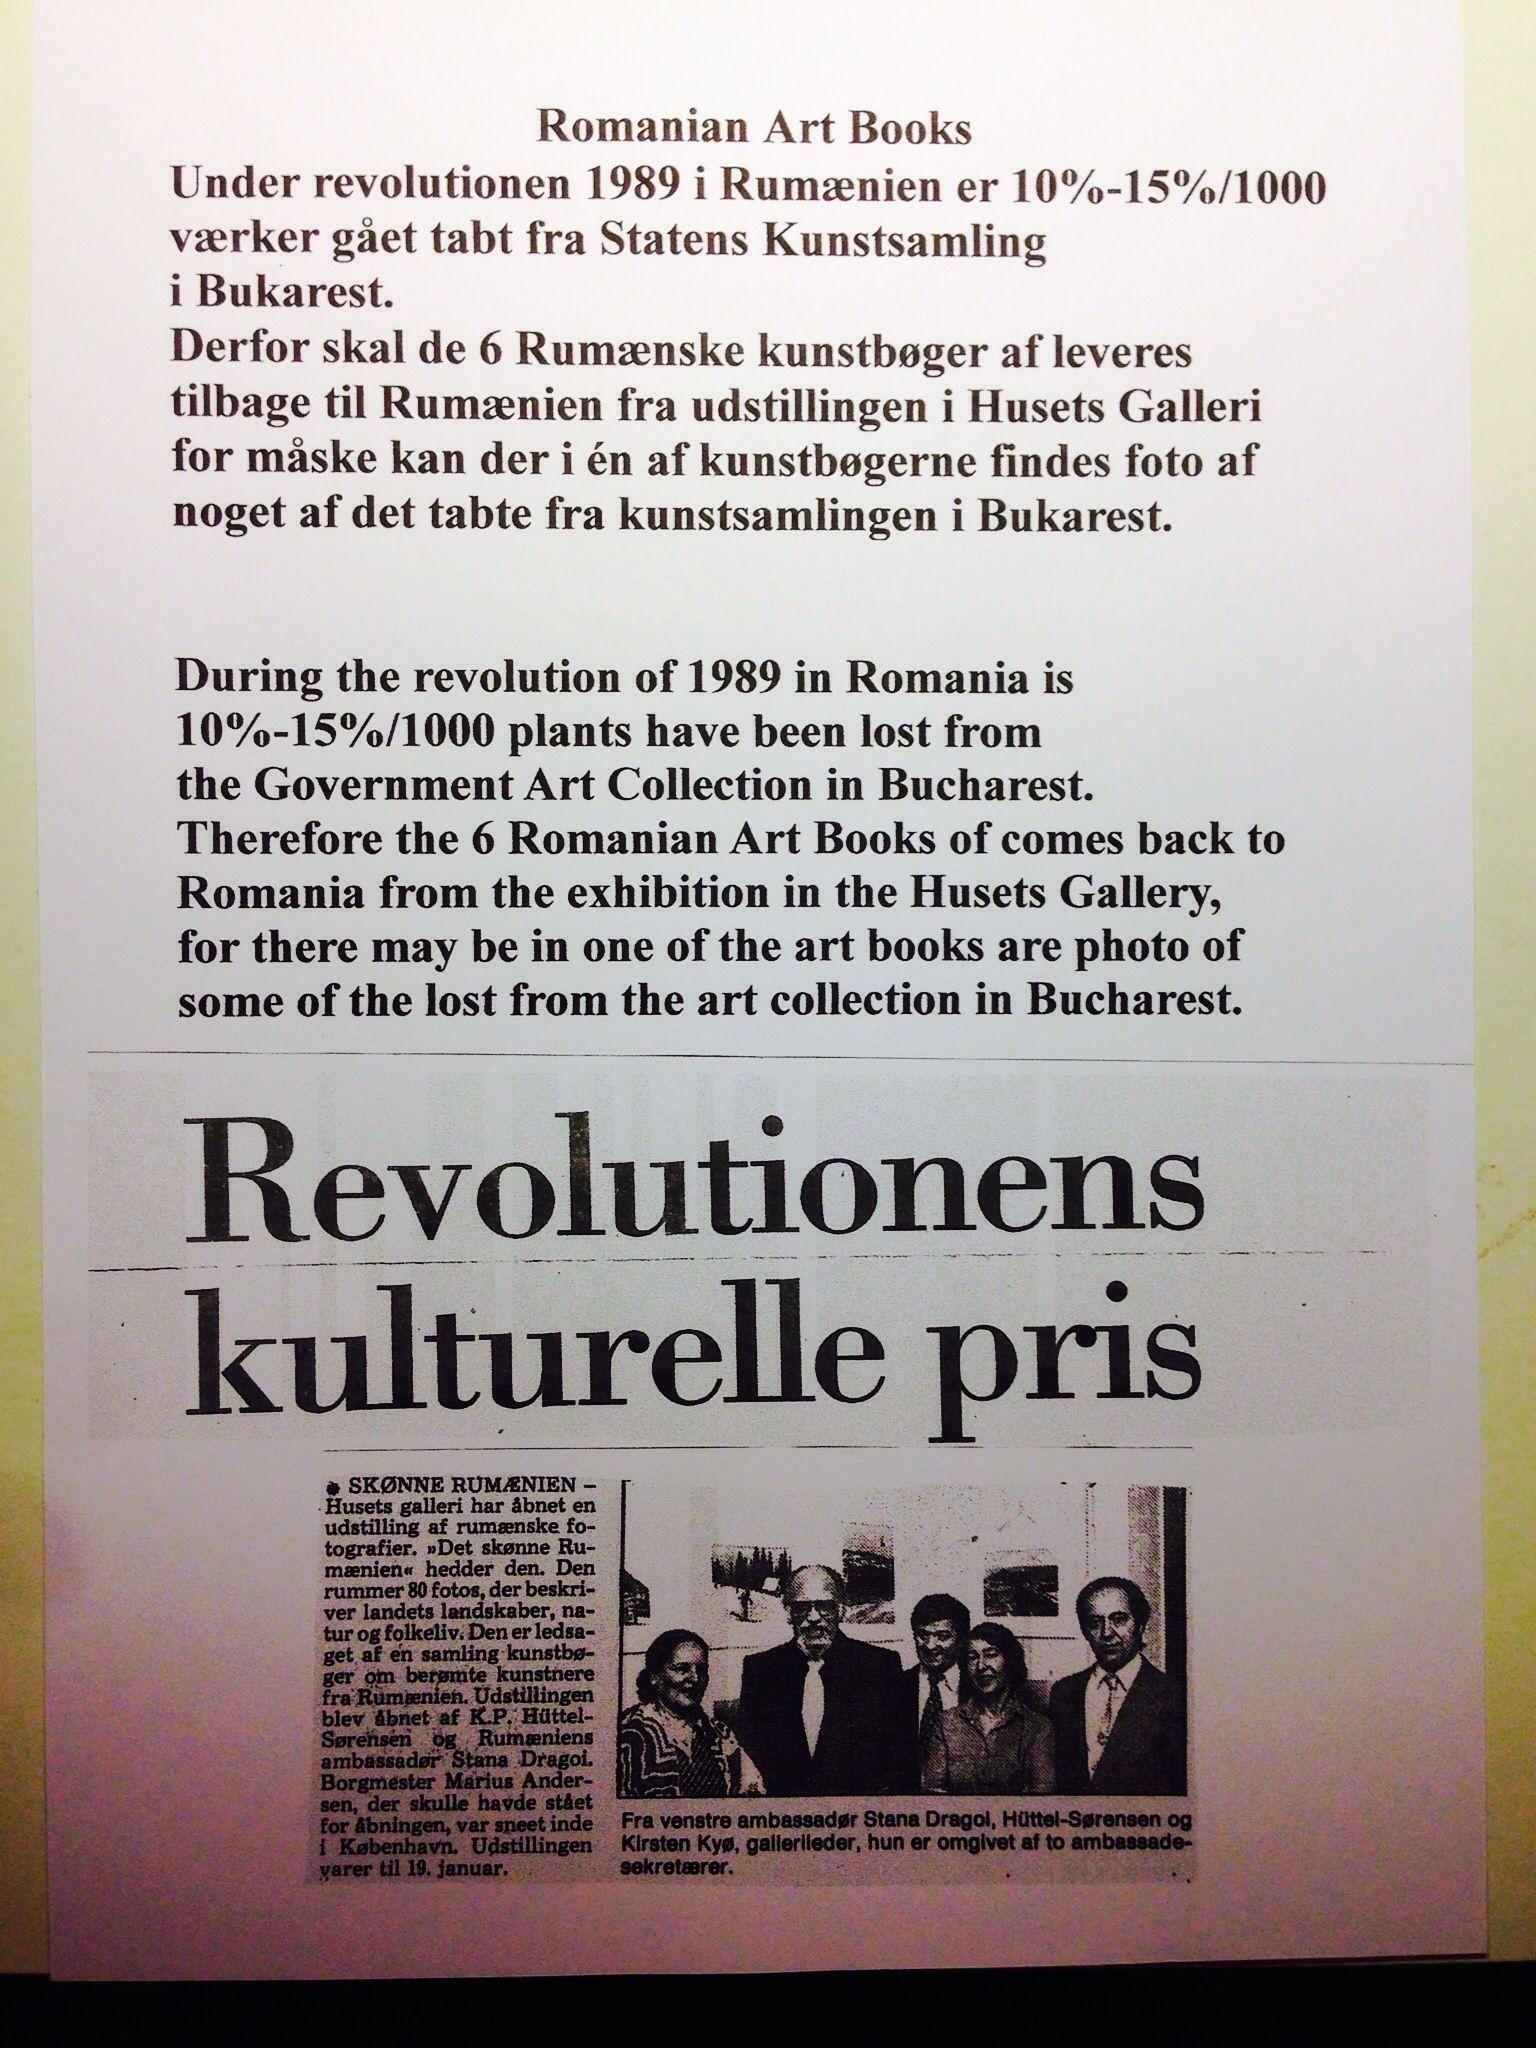 Revolutionens kulturelle pris